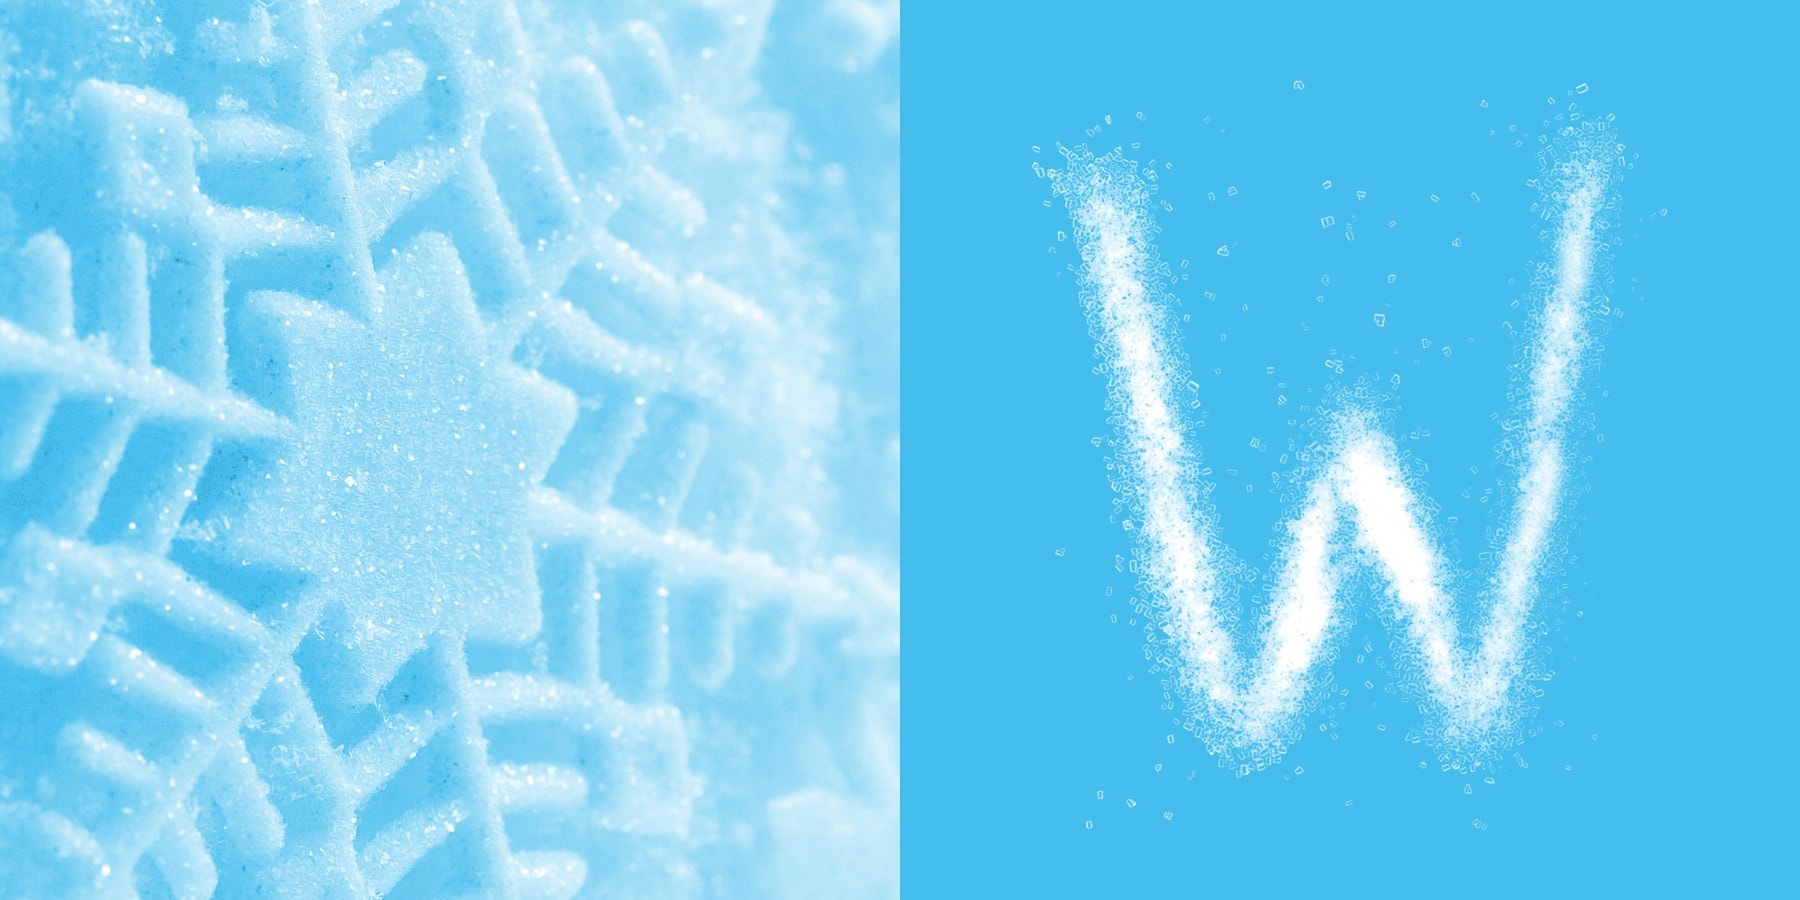 winter-logo-design-02